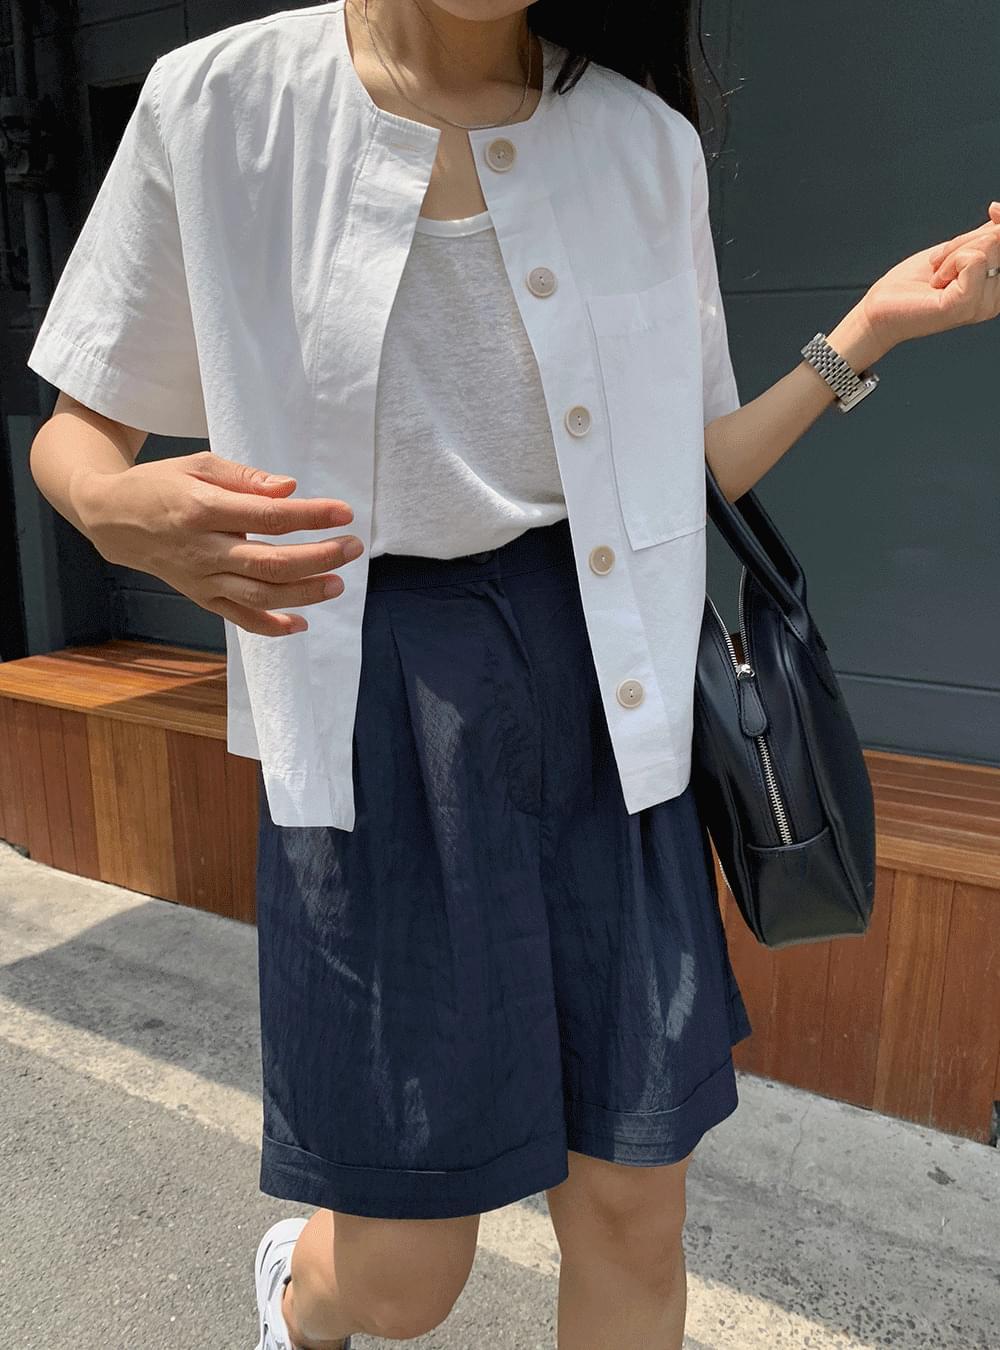 MMMM# Exclusive Order/Same Day Shipping No-collar Hidden Short Sleeve Shirt Jacket